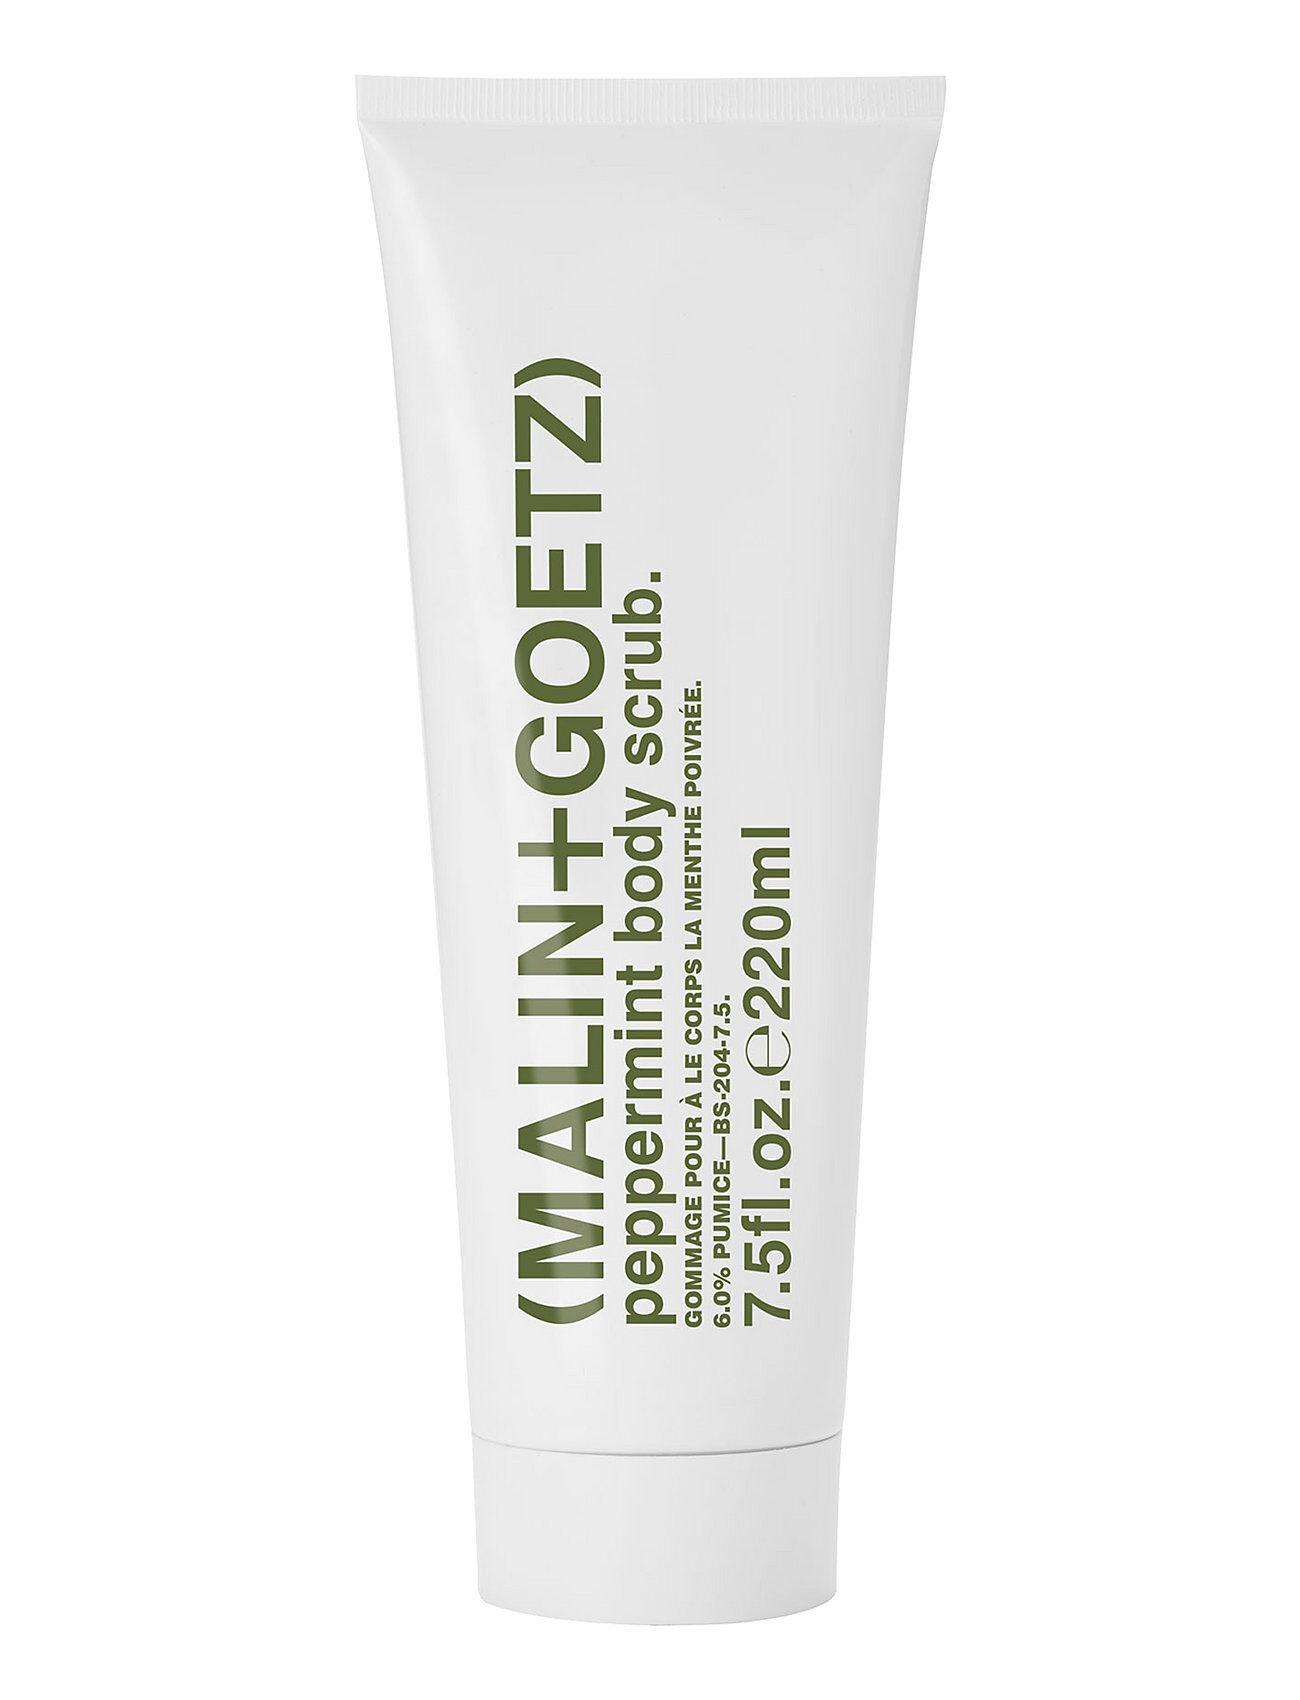 Malin+Goetz Peppermint Body Scrub